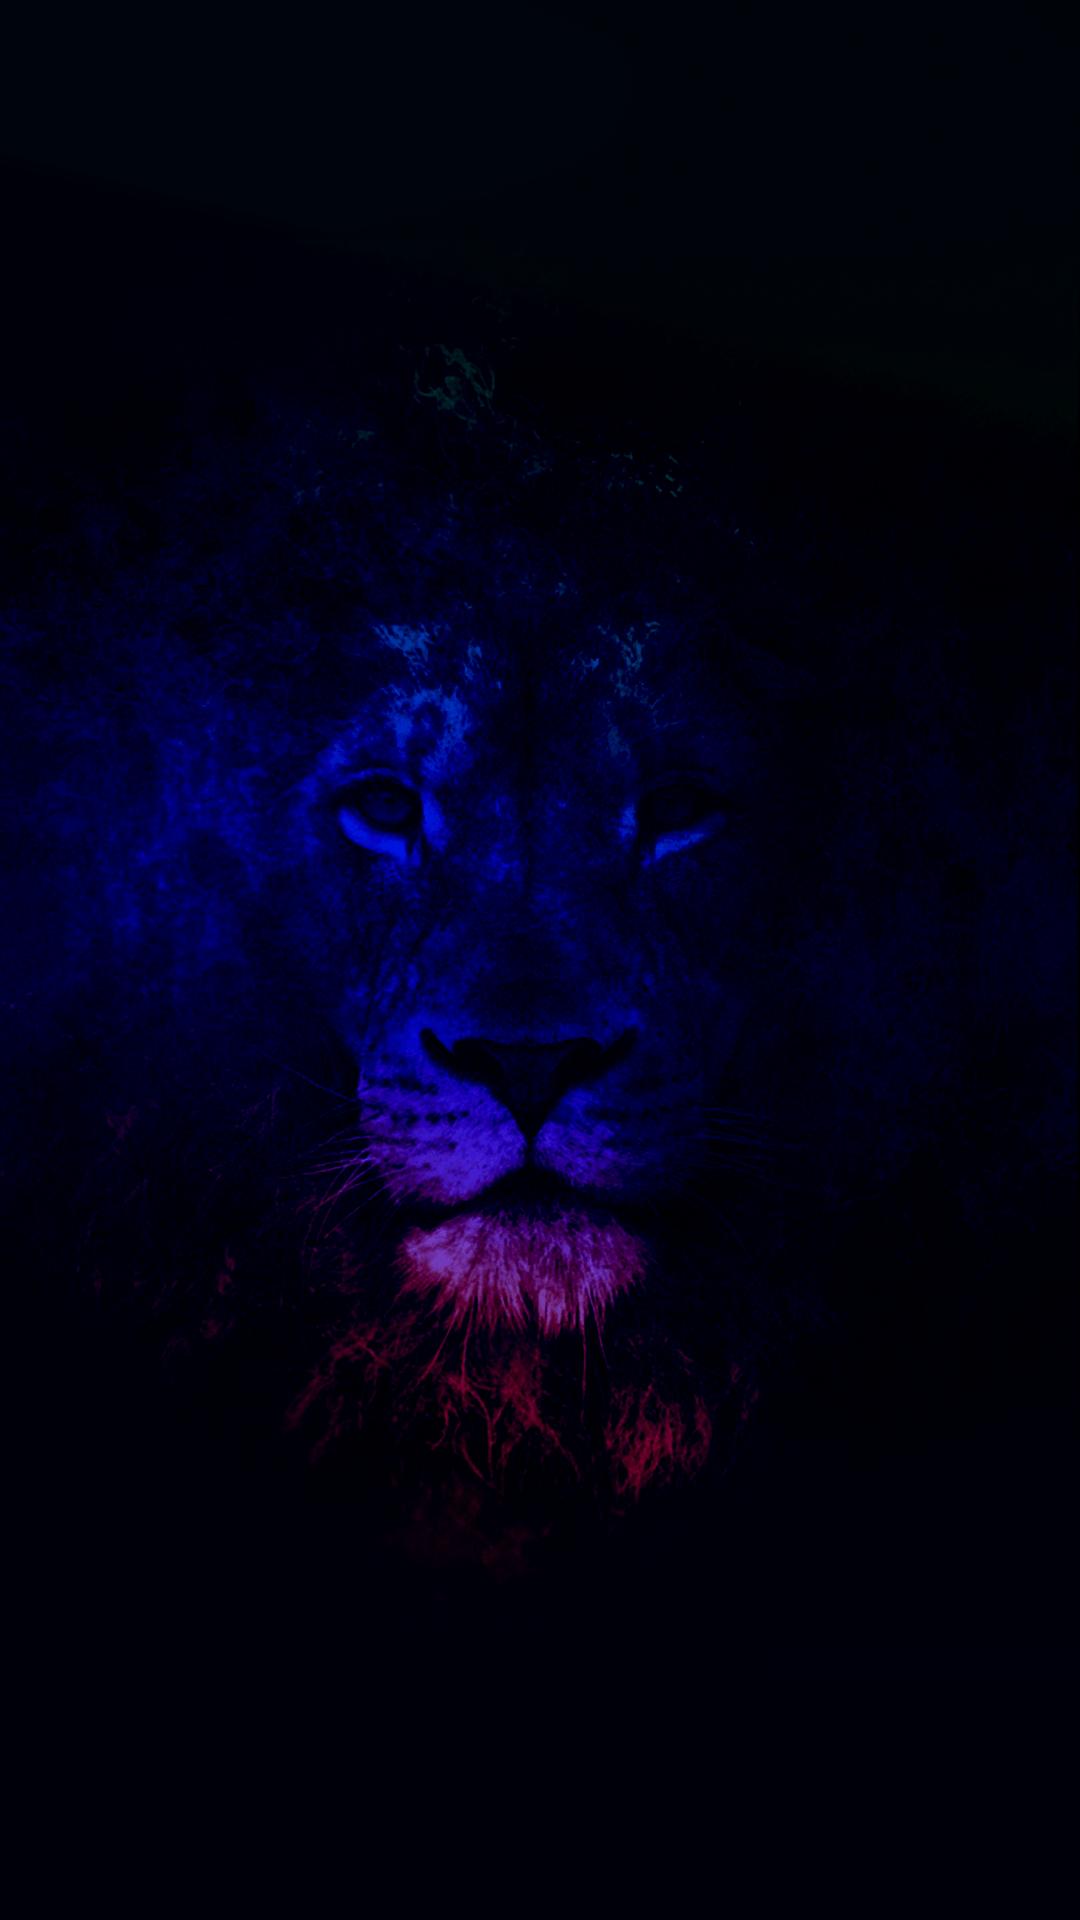 Lion Iphone Android Iphone Desktop Hd Backgrounds Wallpapers 1080p 4k Lion Wallpaper Lion Pictures Lion Wallpaper Iphone